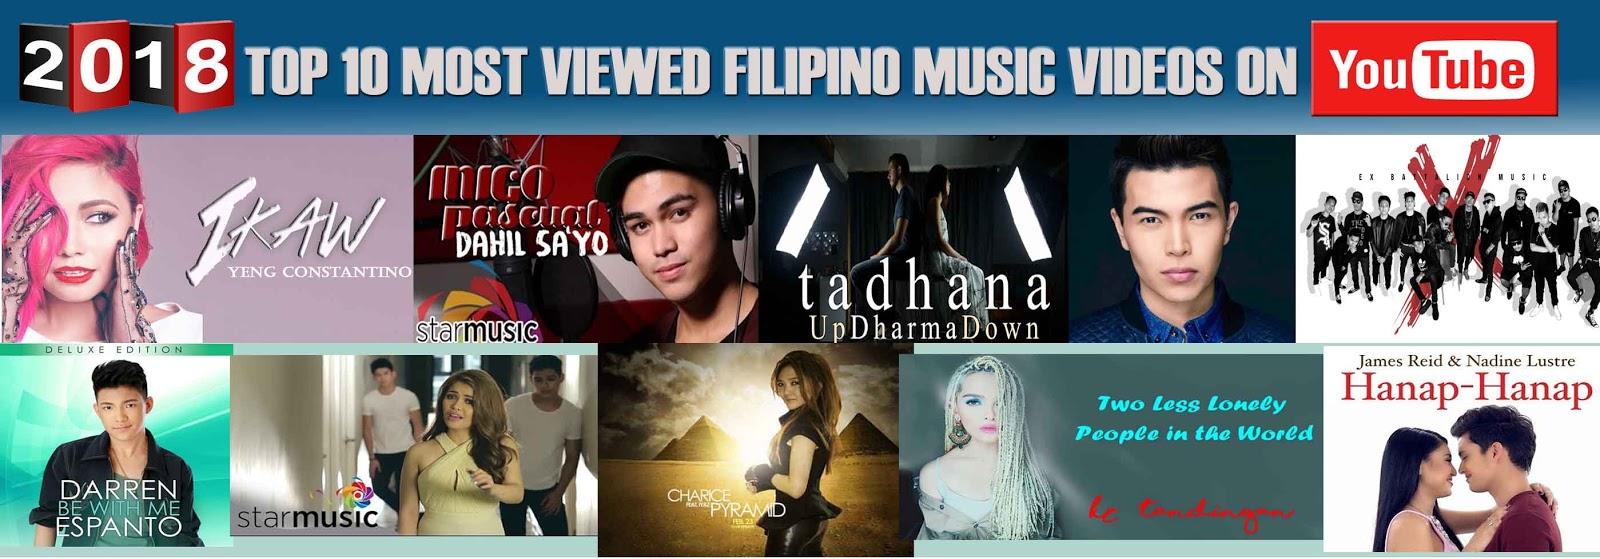 Nextfactorph Top 40 Most Viewed Filipino Music Videos On Youtube